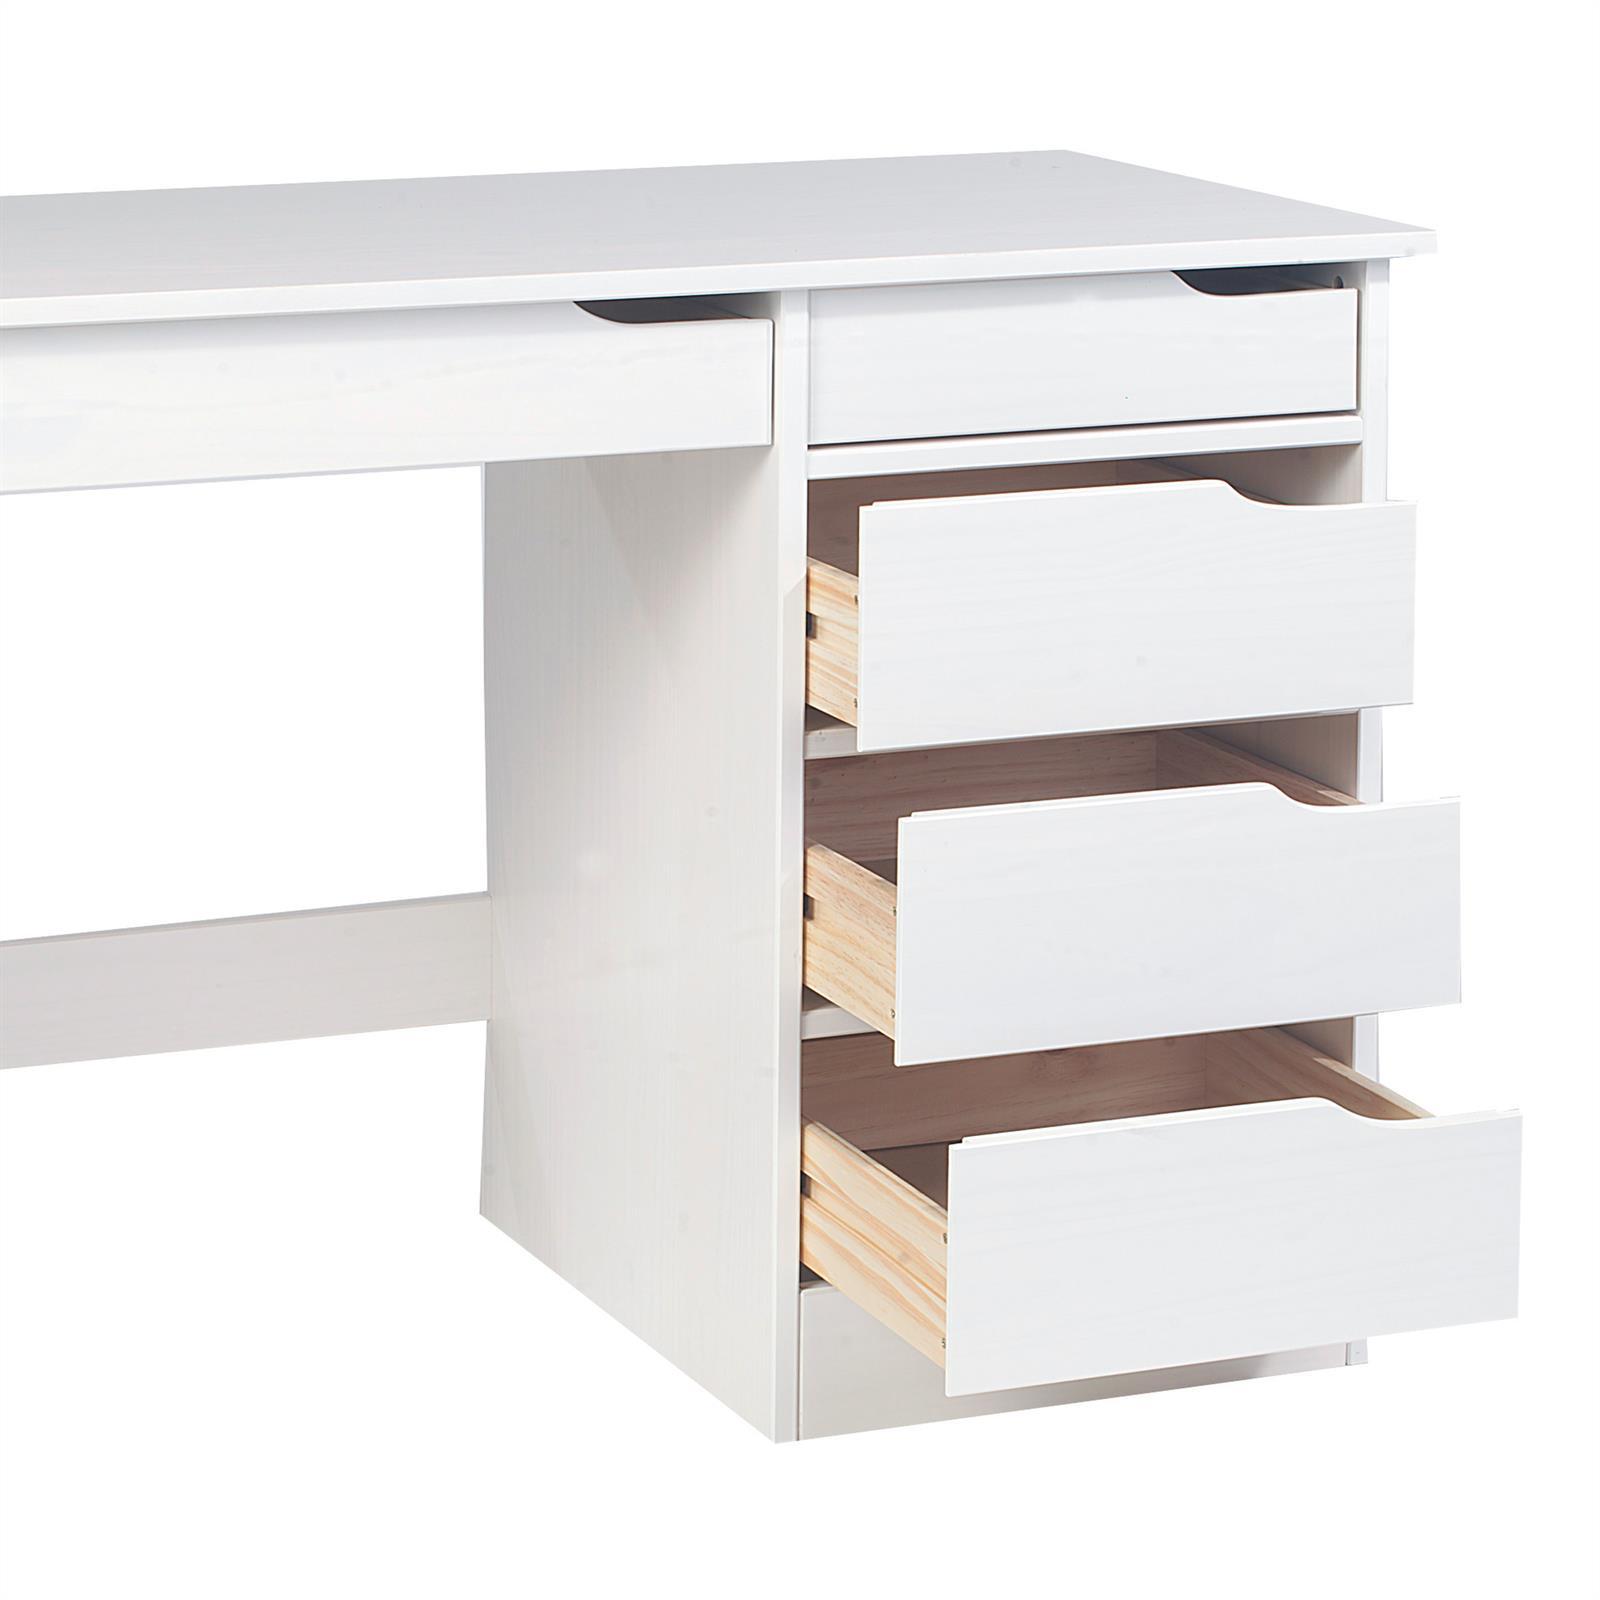 schreibtisch hugo in kiefer massiv wei mobilia24. Black Bedroom Furniture Sets. Home Design Ideas